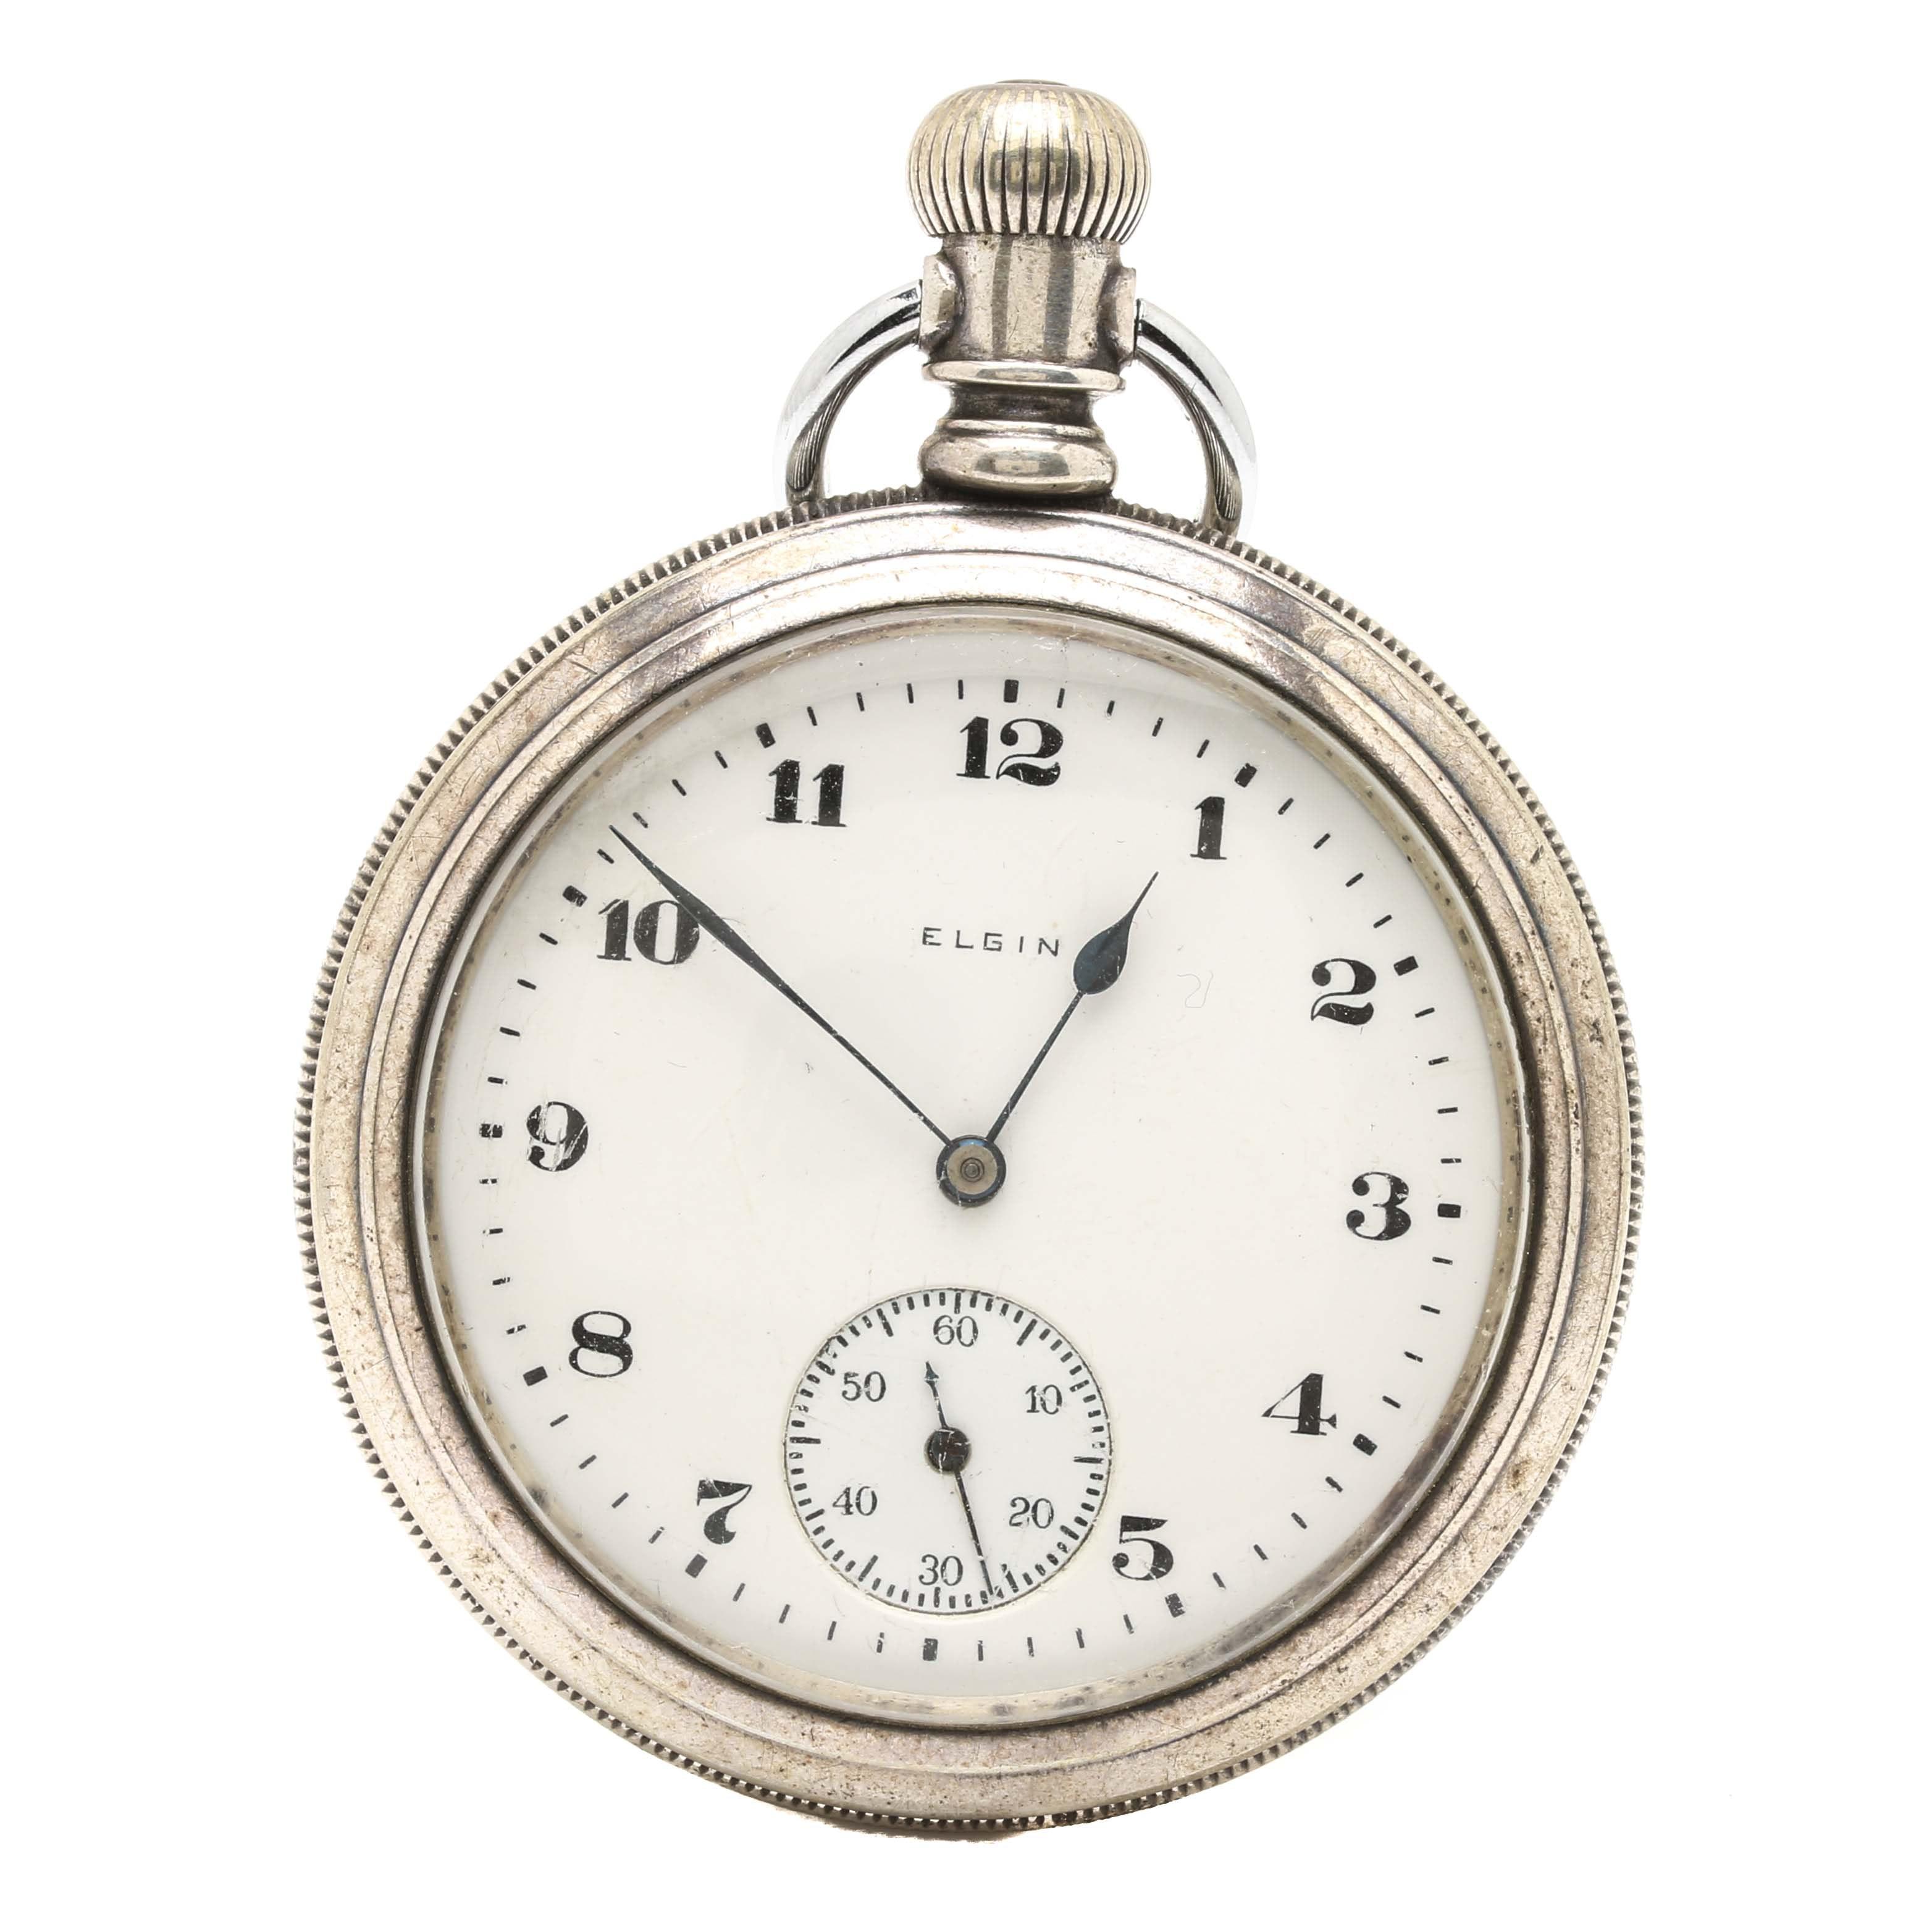 Circa 1905 Sterling Silver Elgin Open-Face Pocket Watch